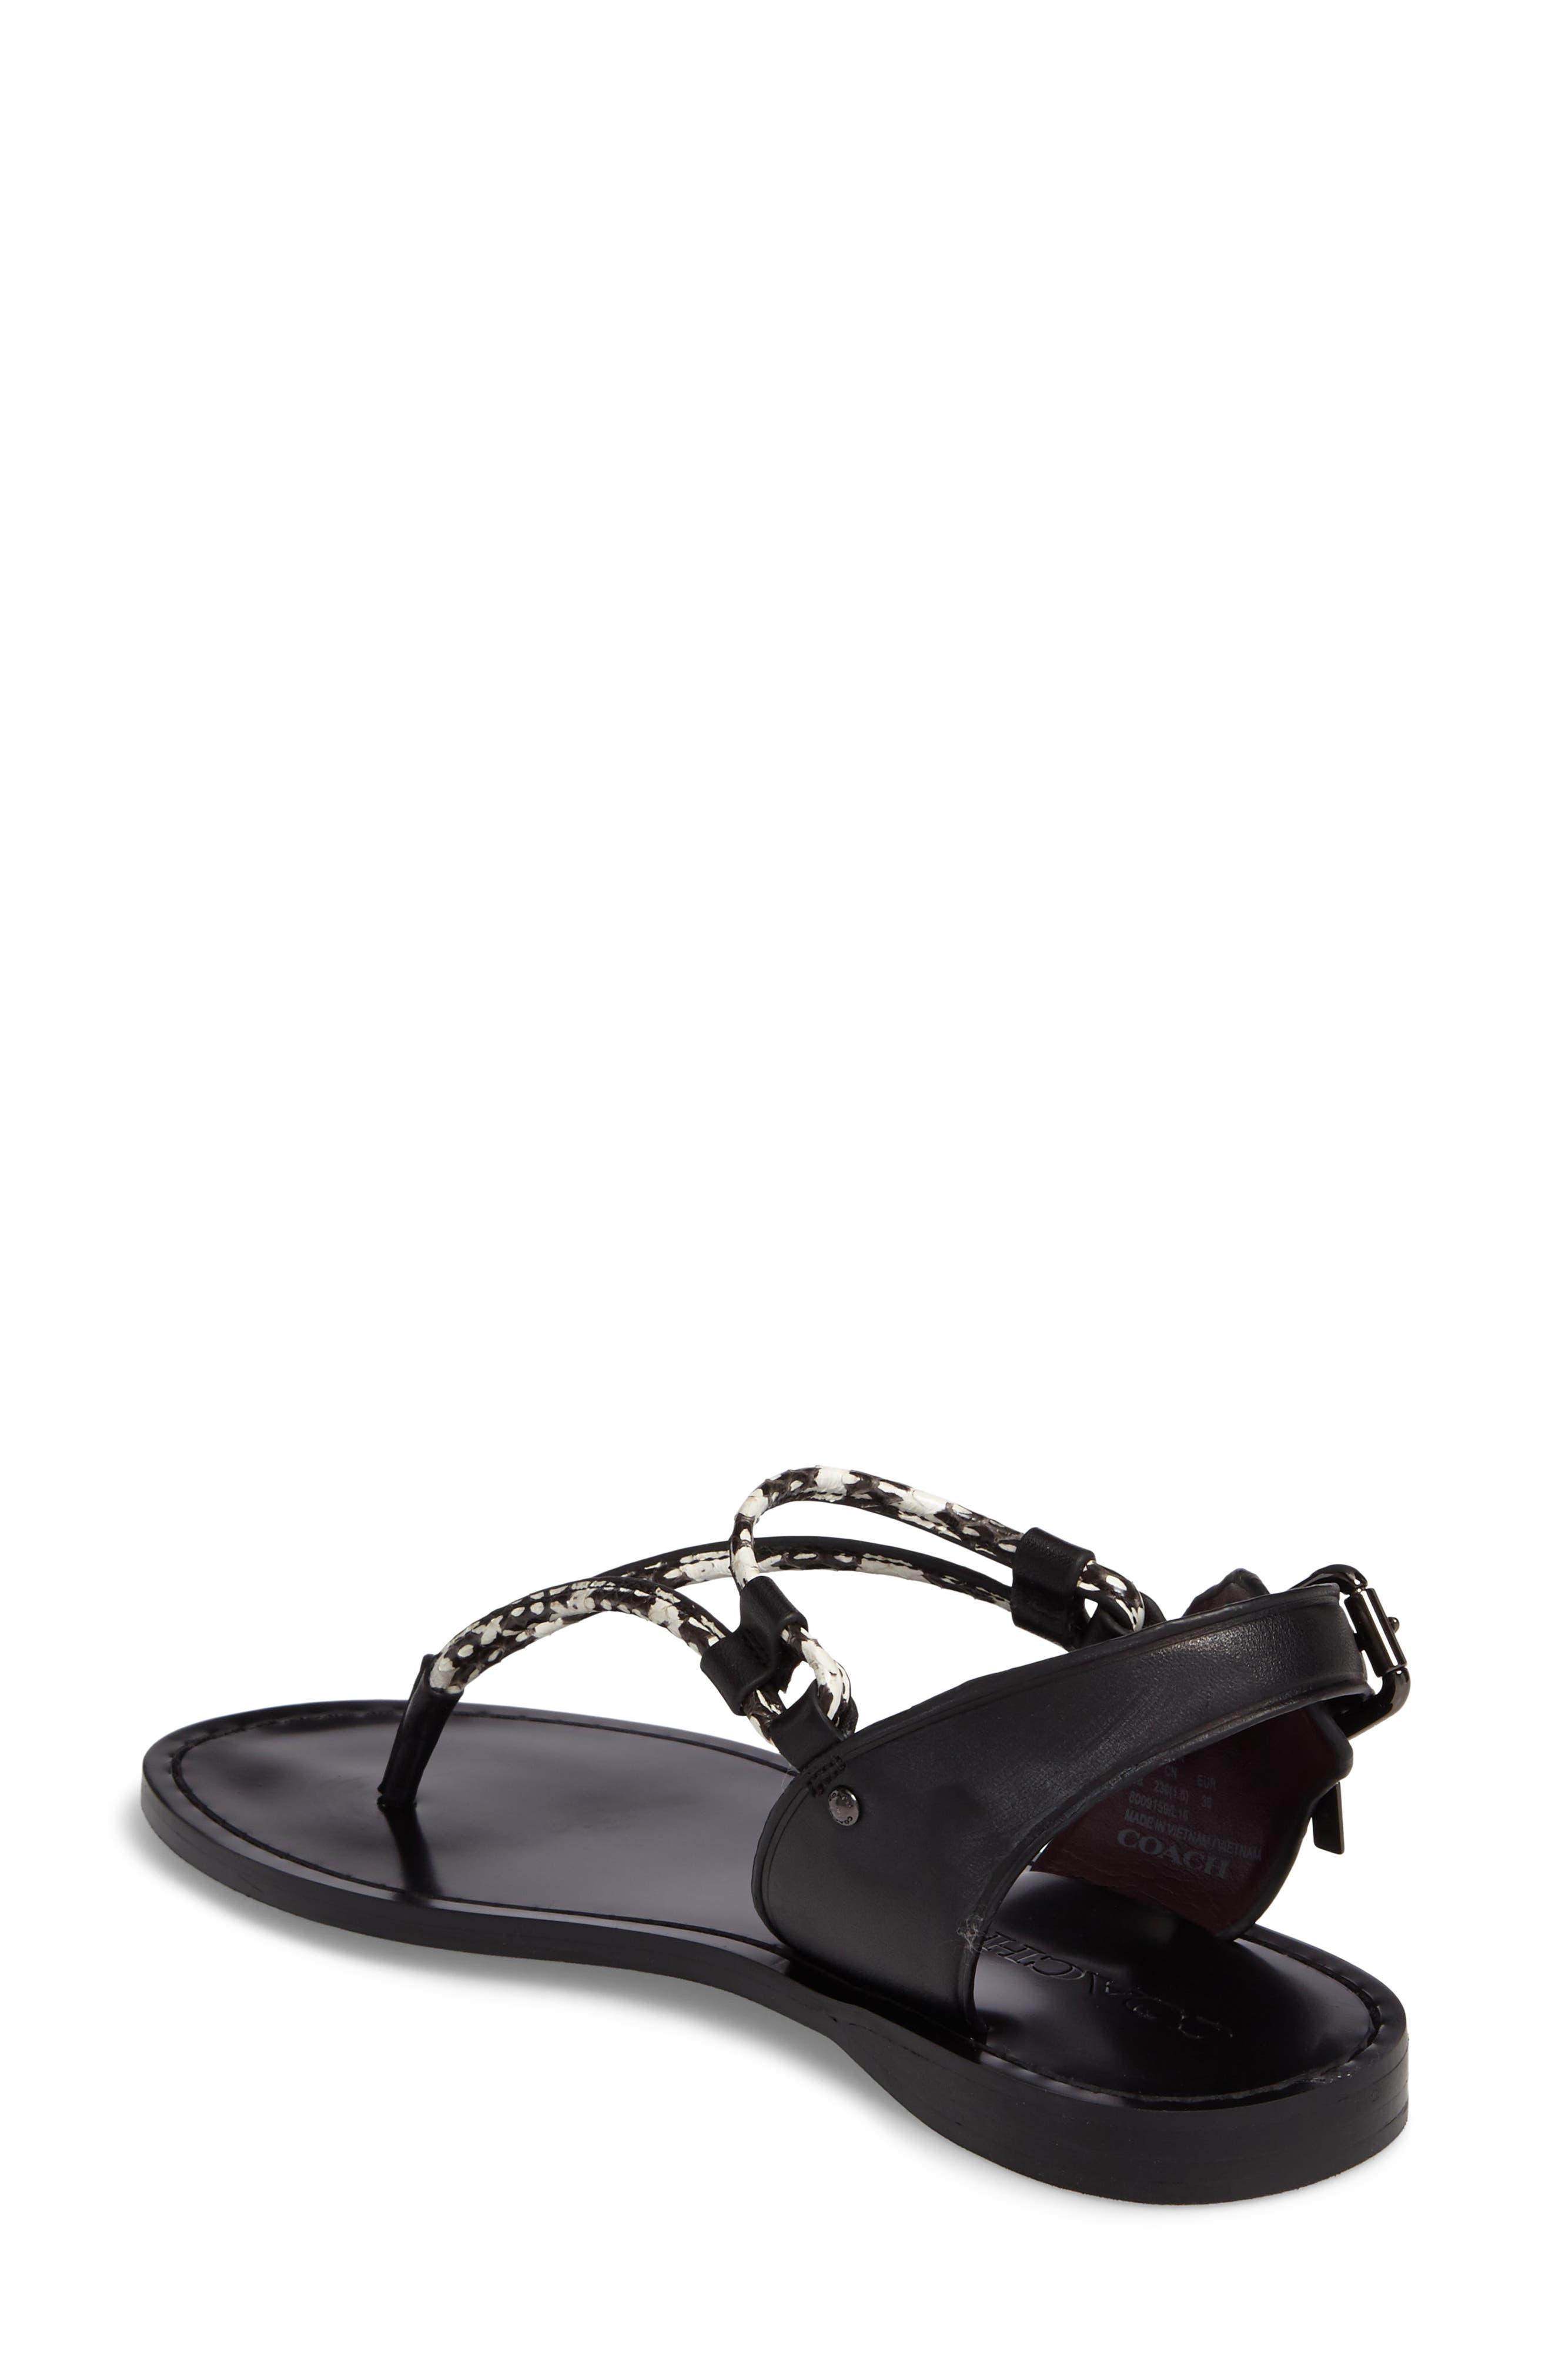 Alternate Image 2  - COACH 'Clarkson' Sandal